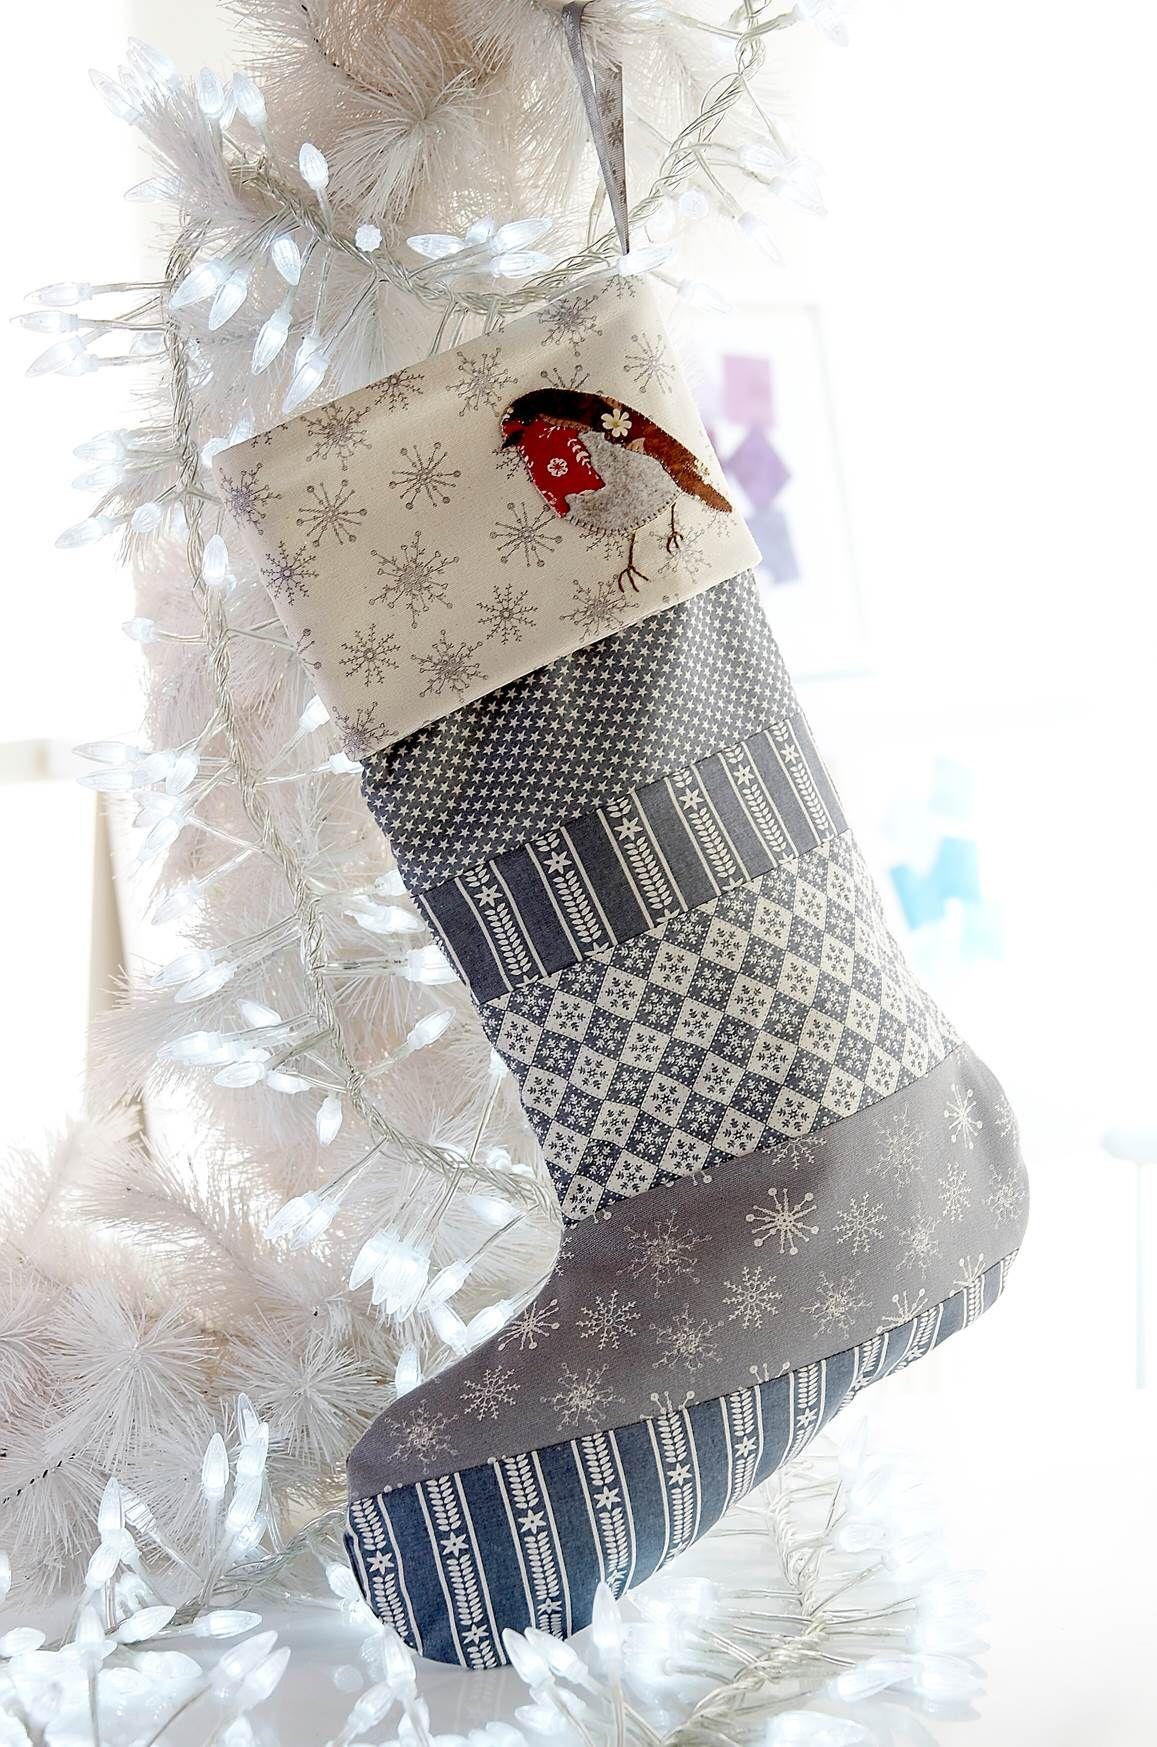 Pin by Angela Easdon on Rainbows | Pinterest | Navidad, Calcetines ...